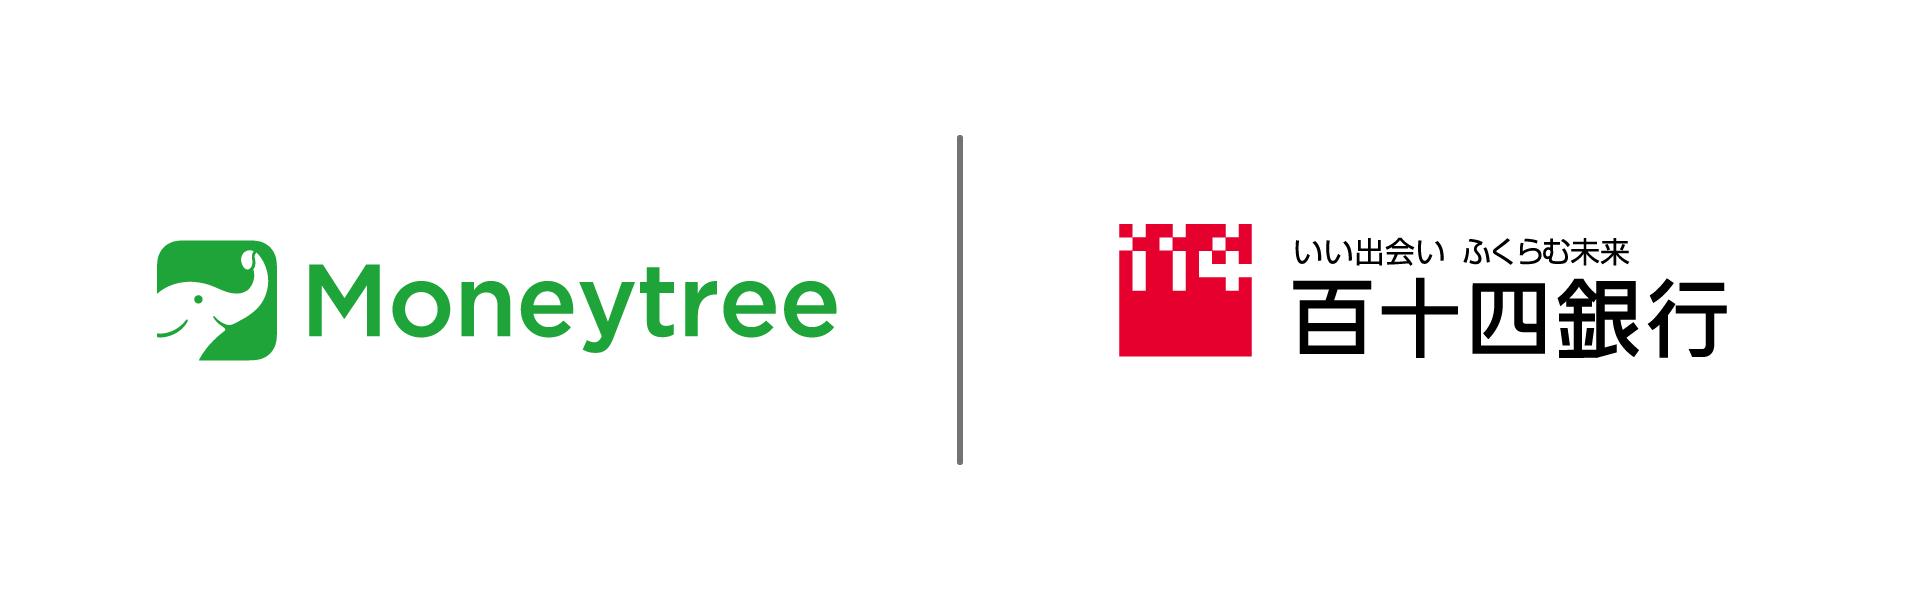 PressRelease 114 Logo